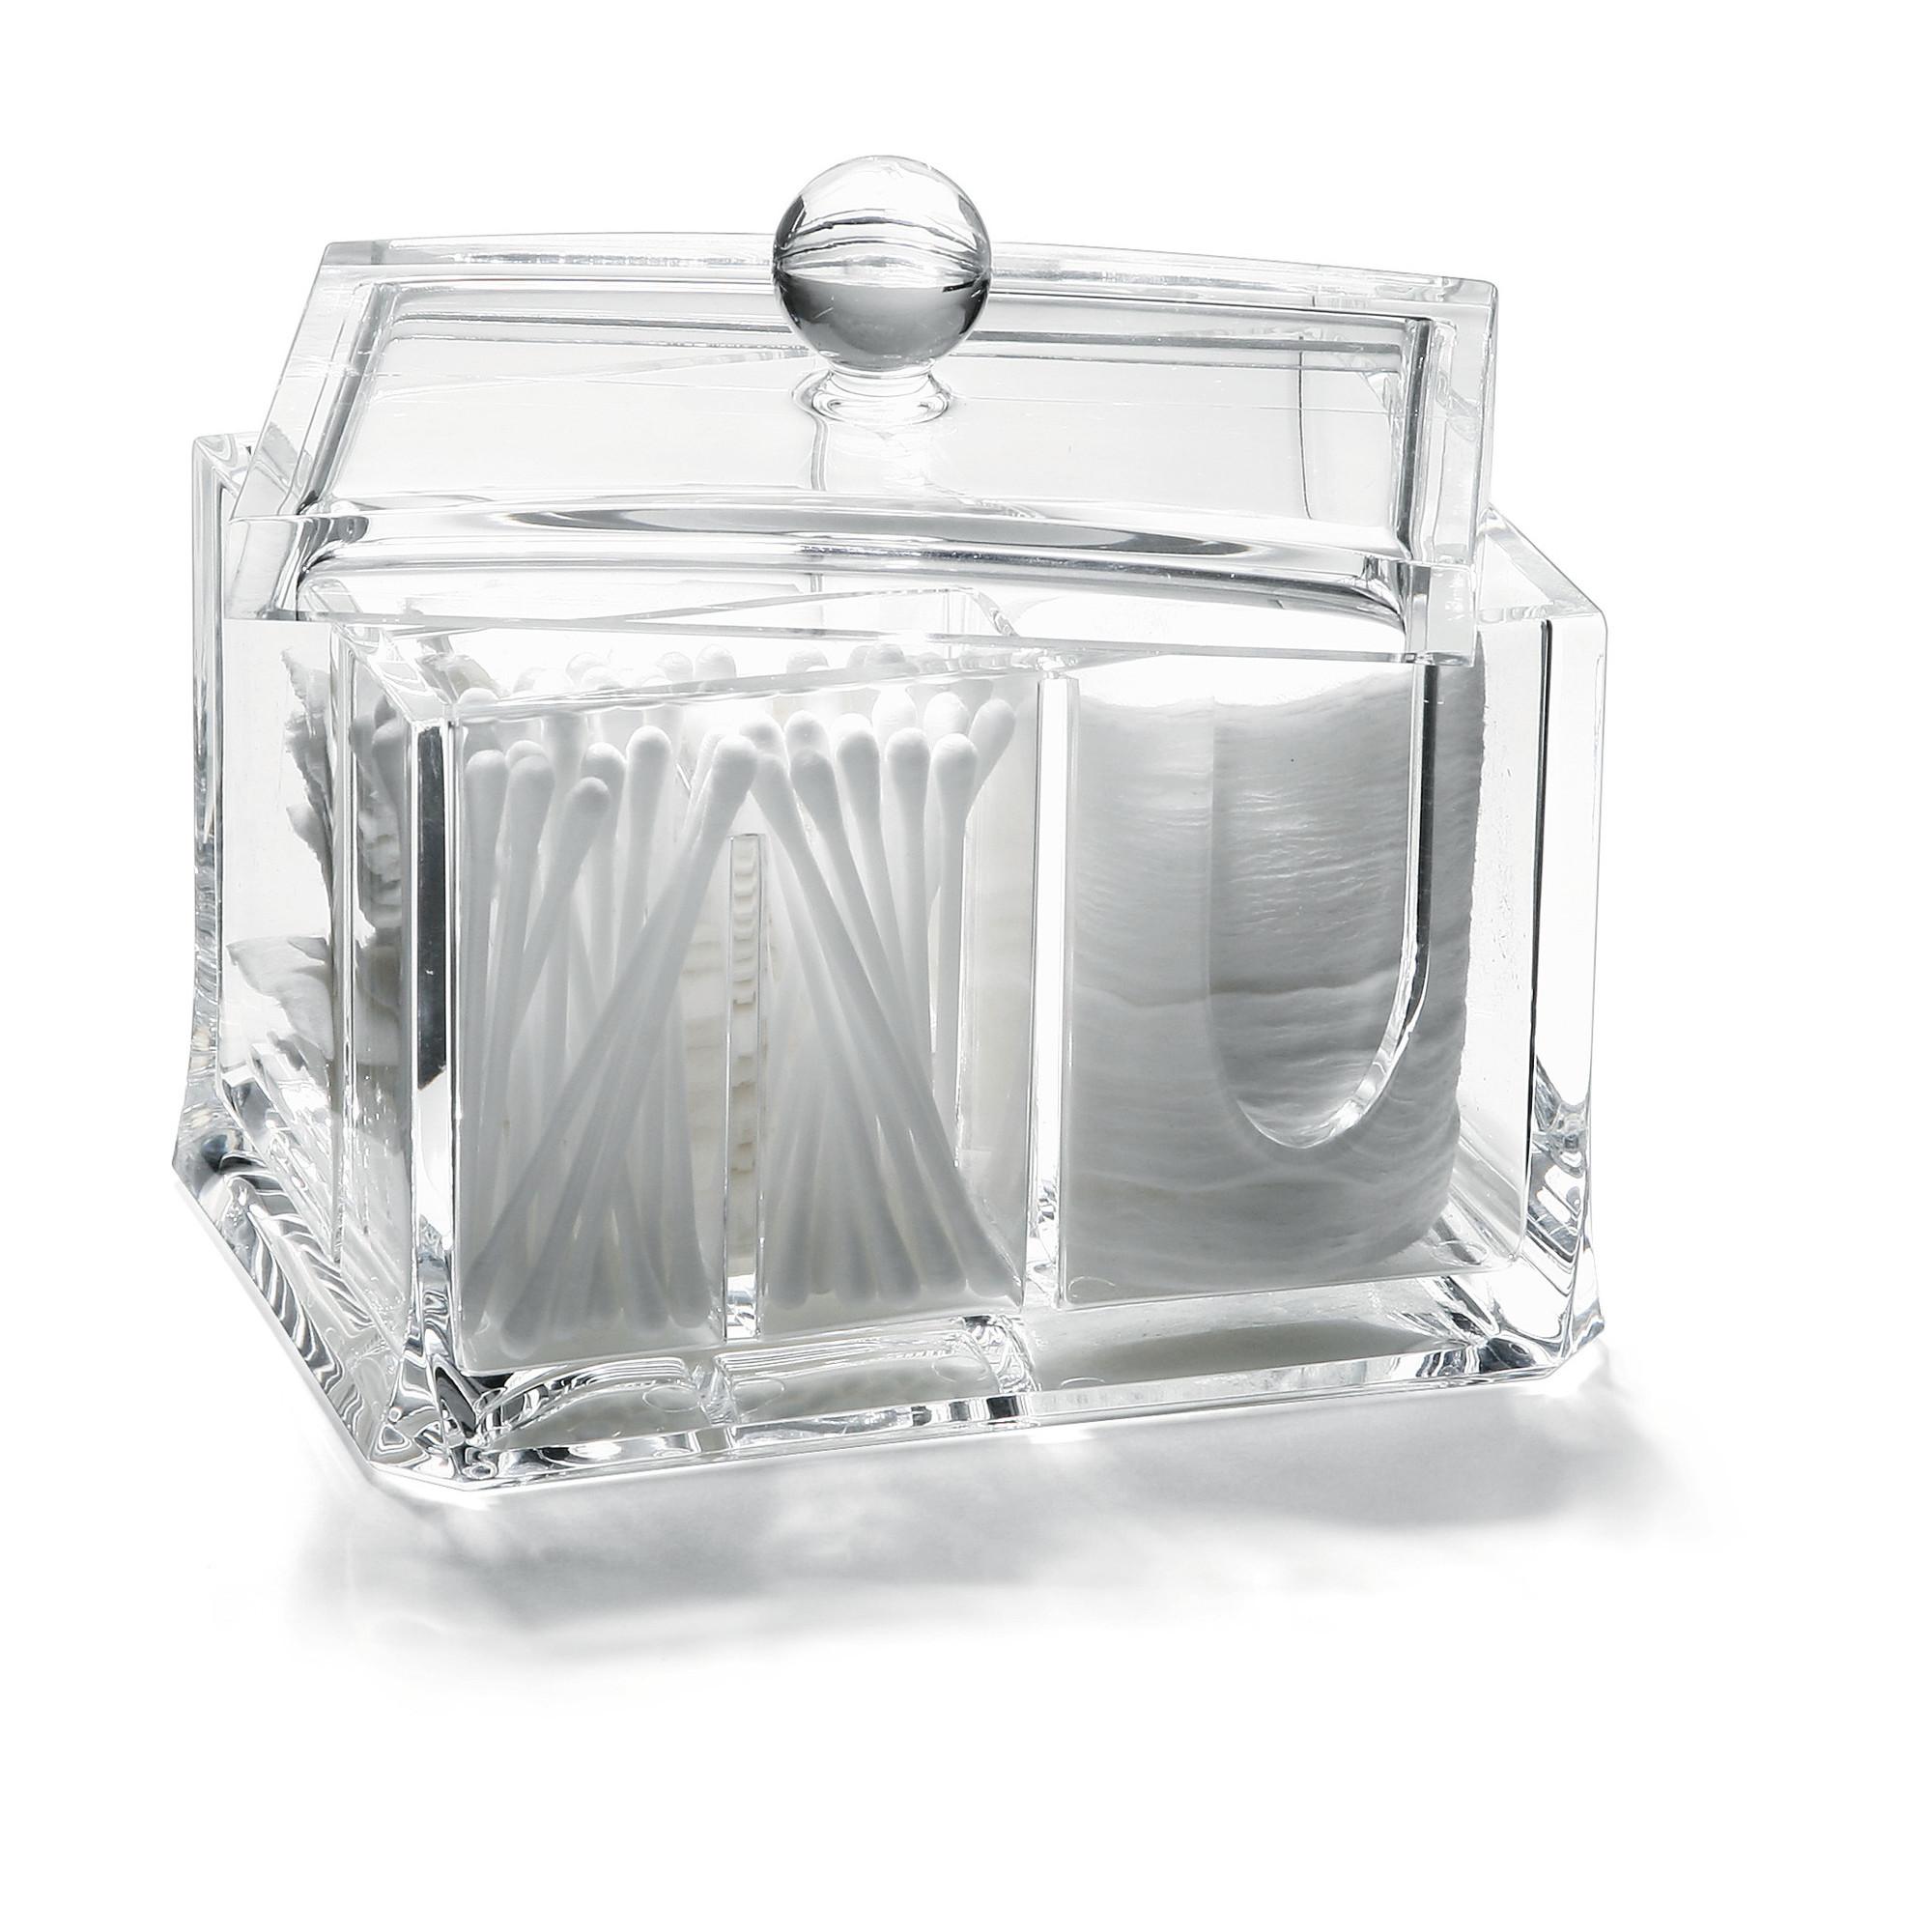 Mouchoirs - 150 pièces - Ruck